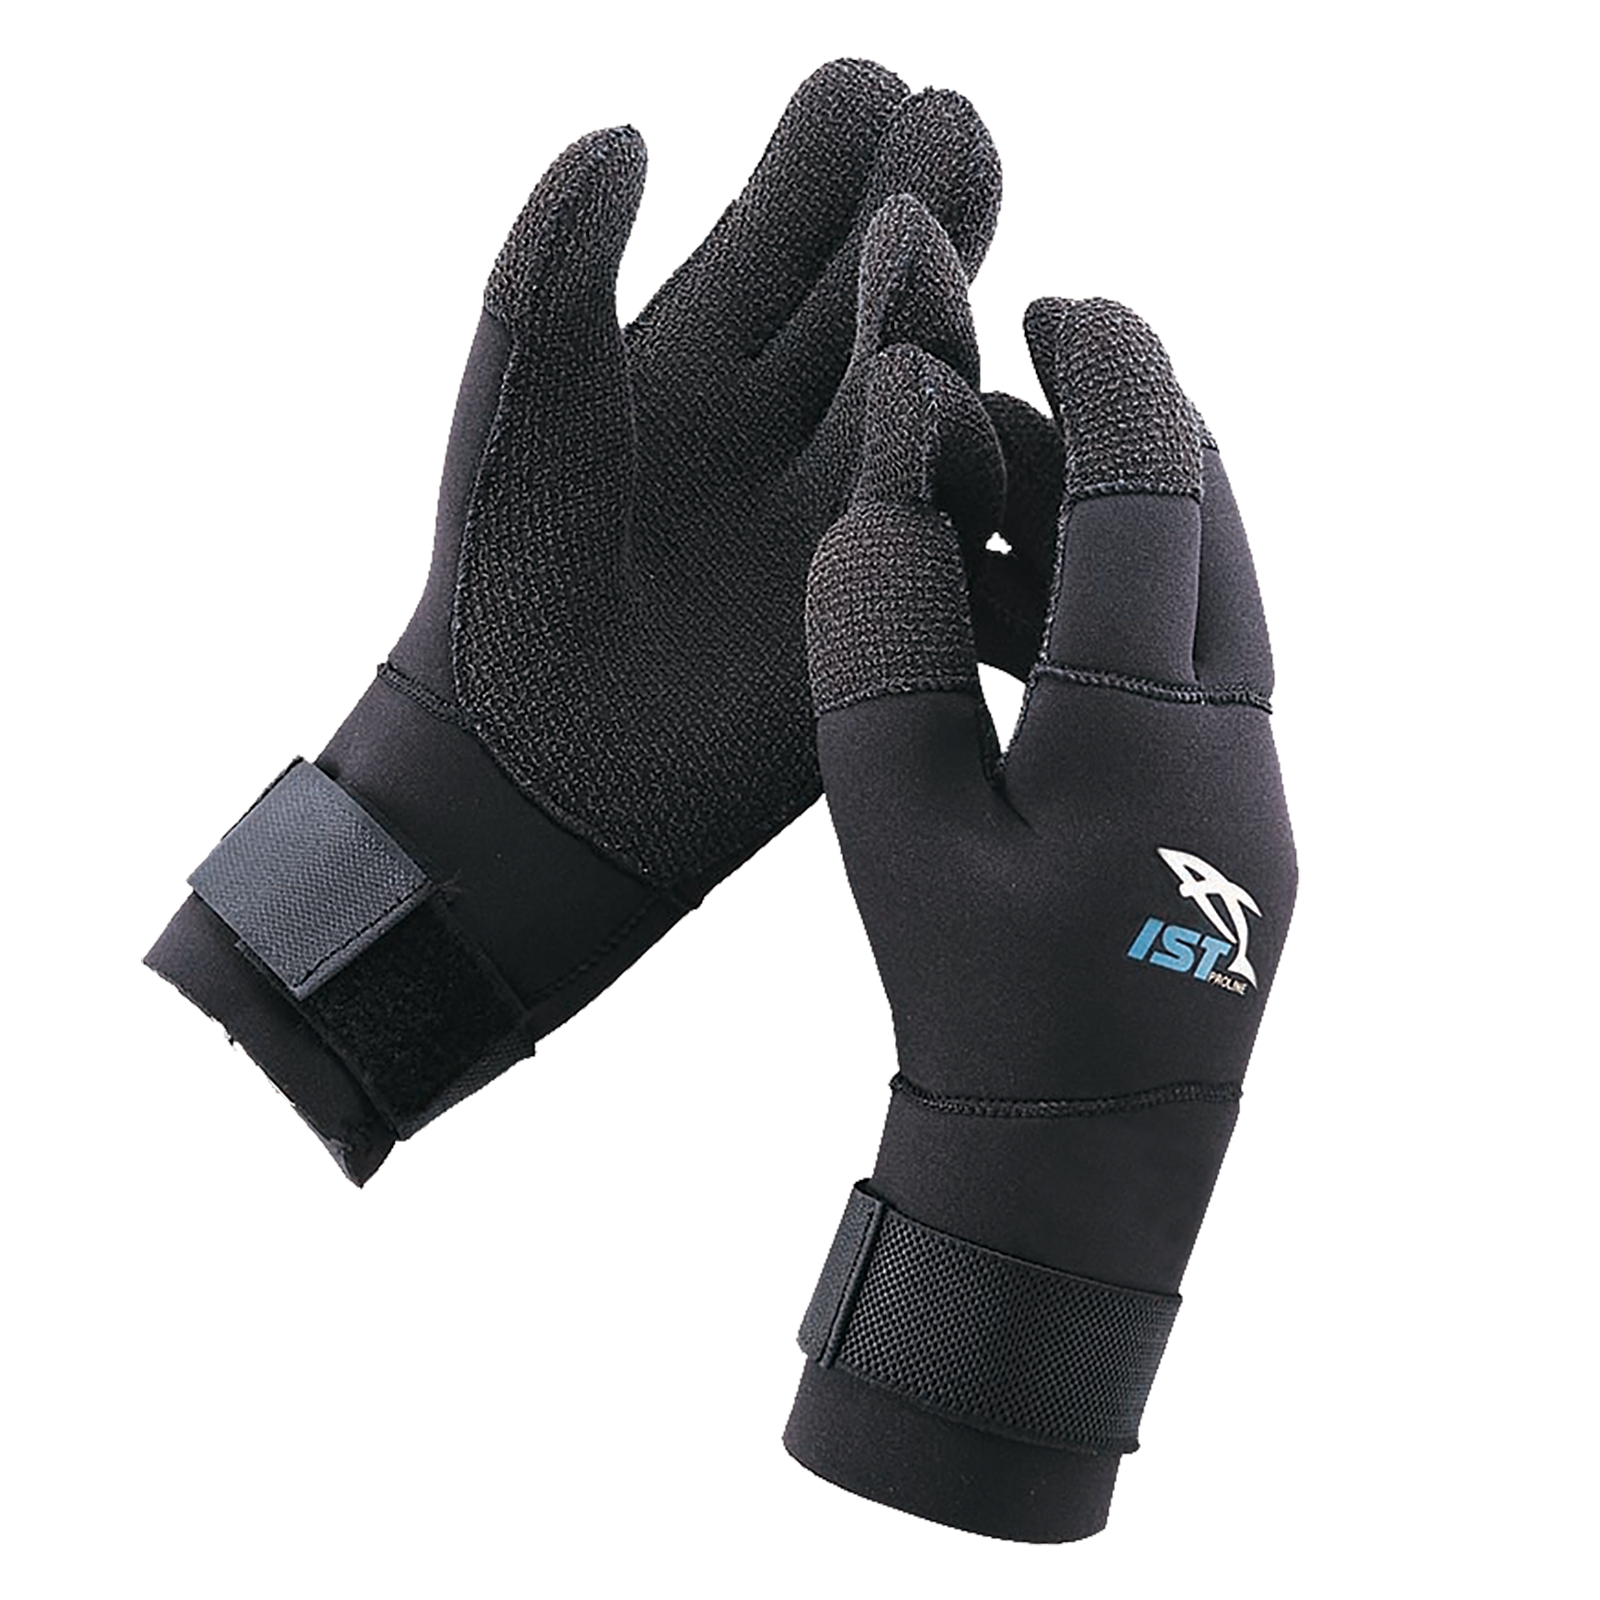 5mm semi-dry glove